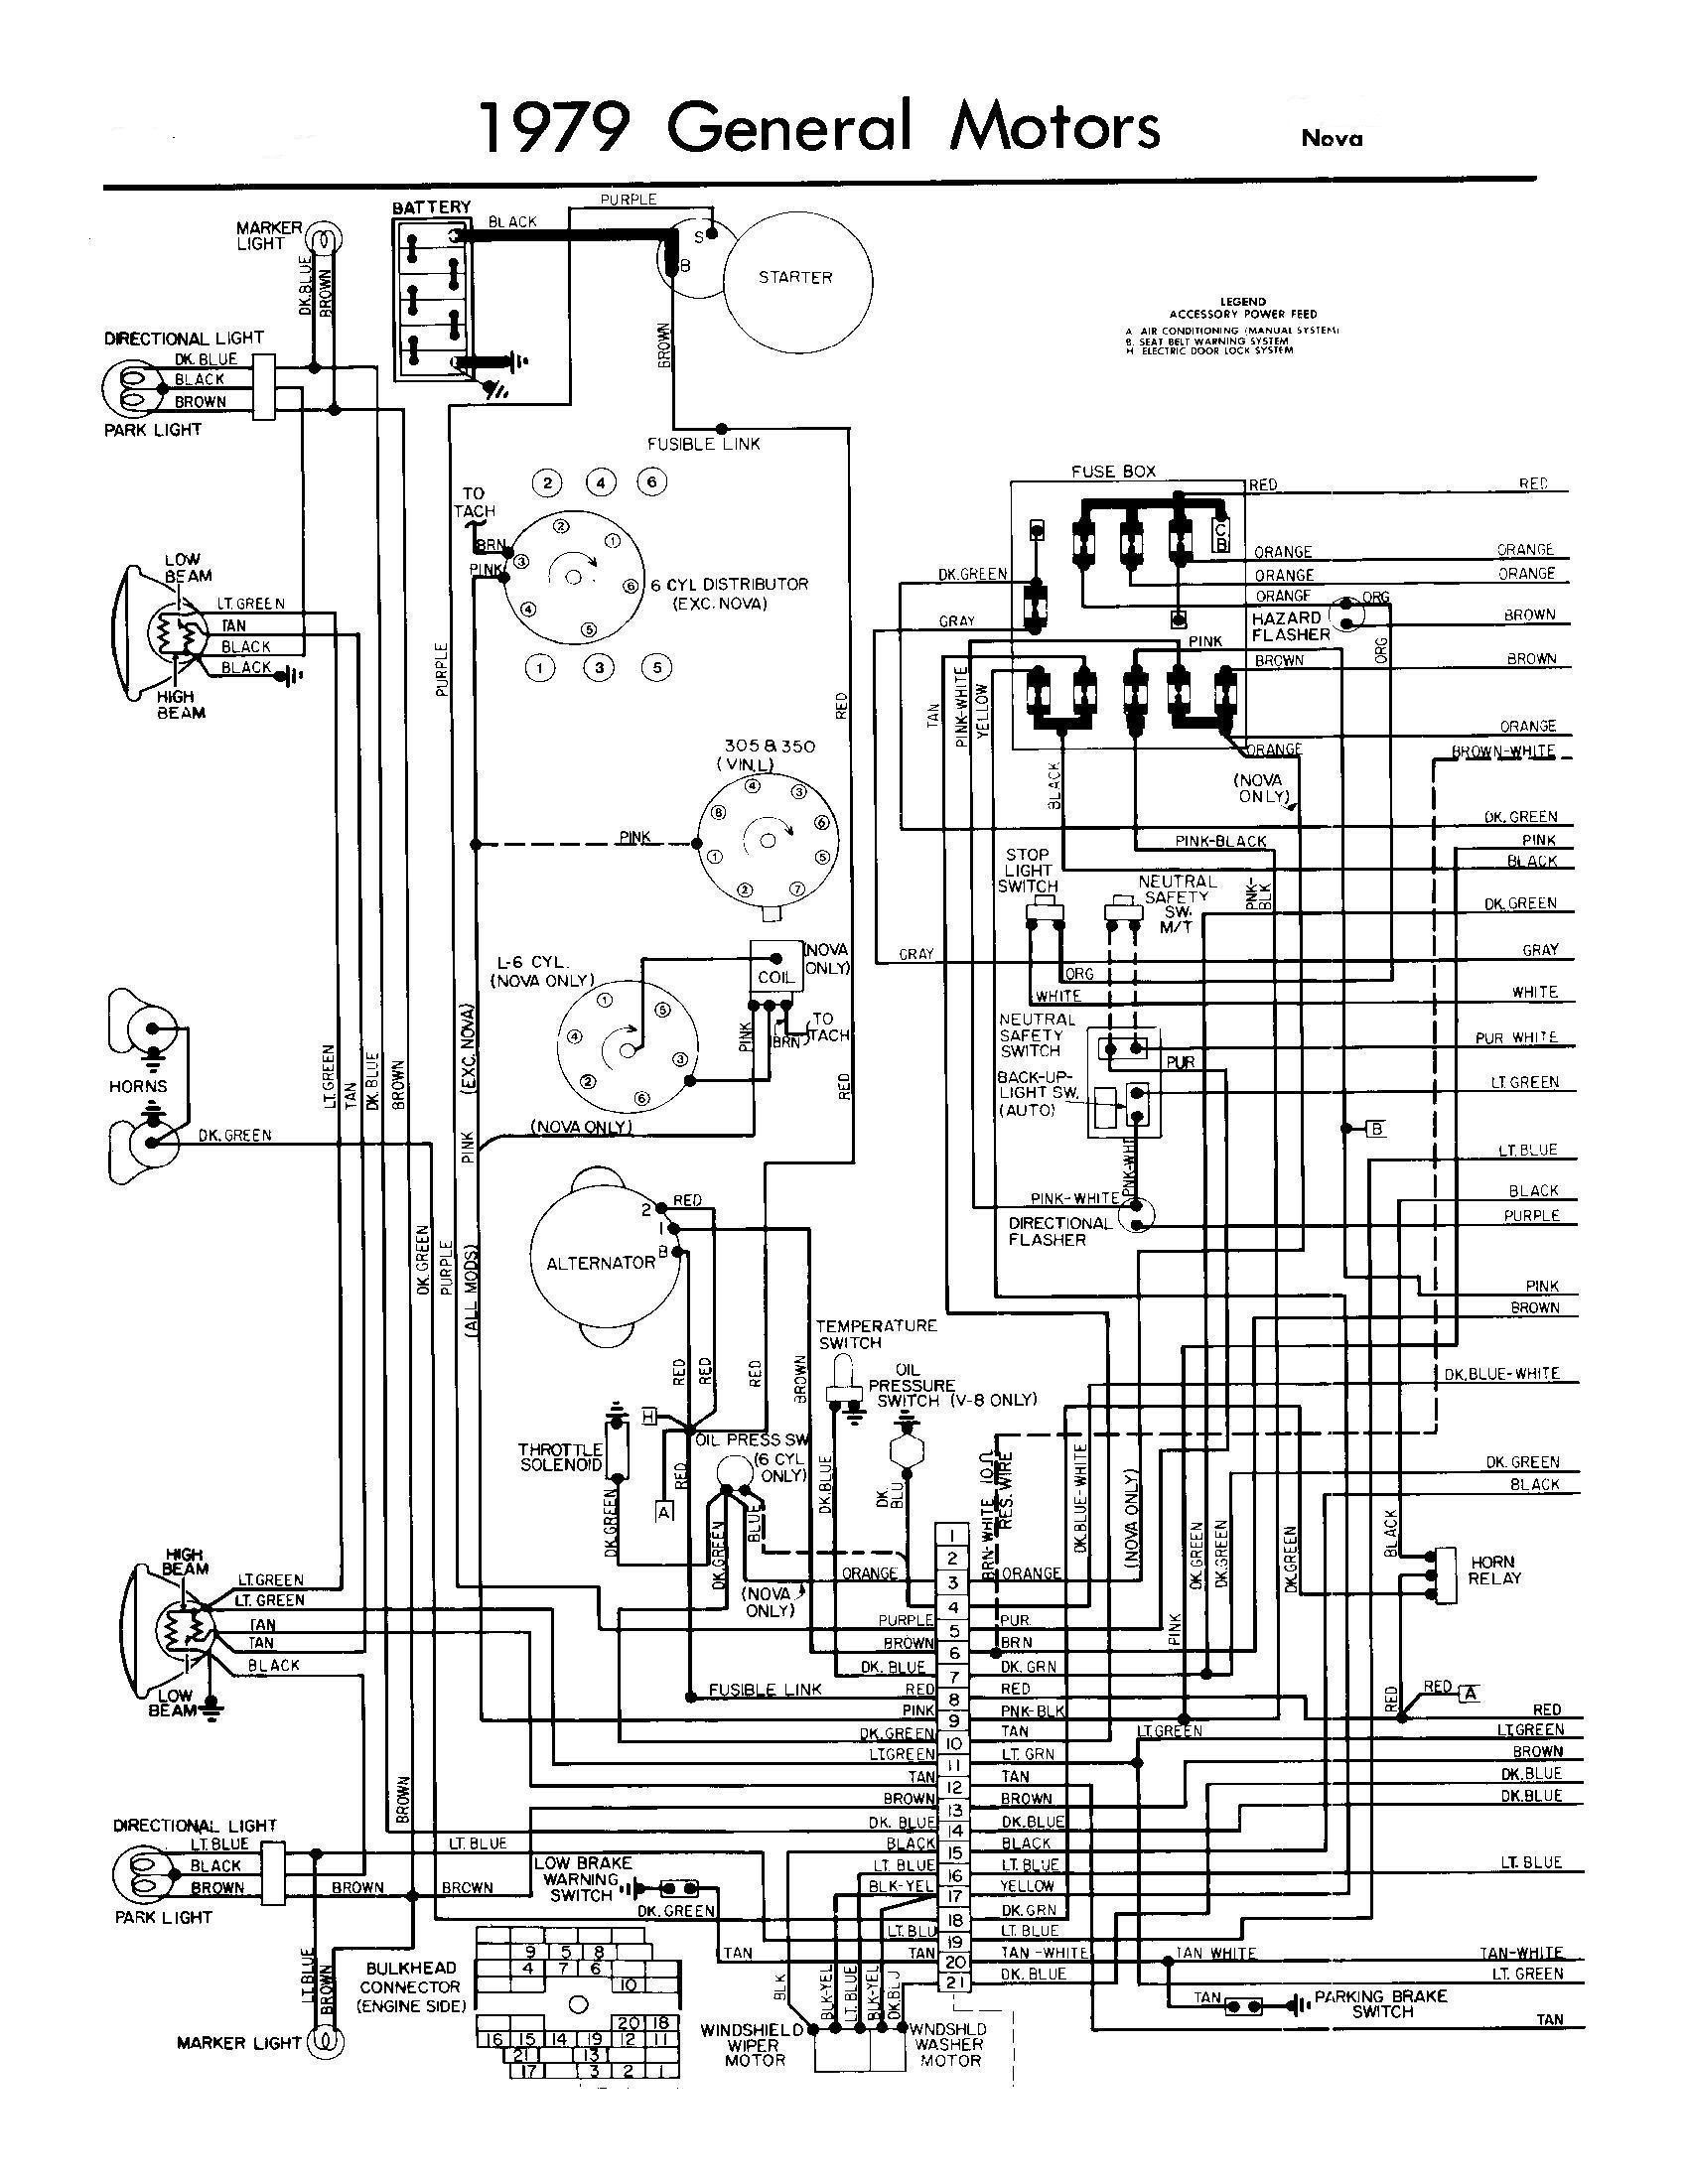 1973 chevy truck wiring diagram 57 65 chevy wiring